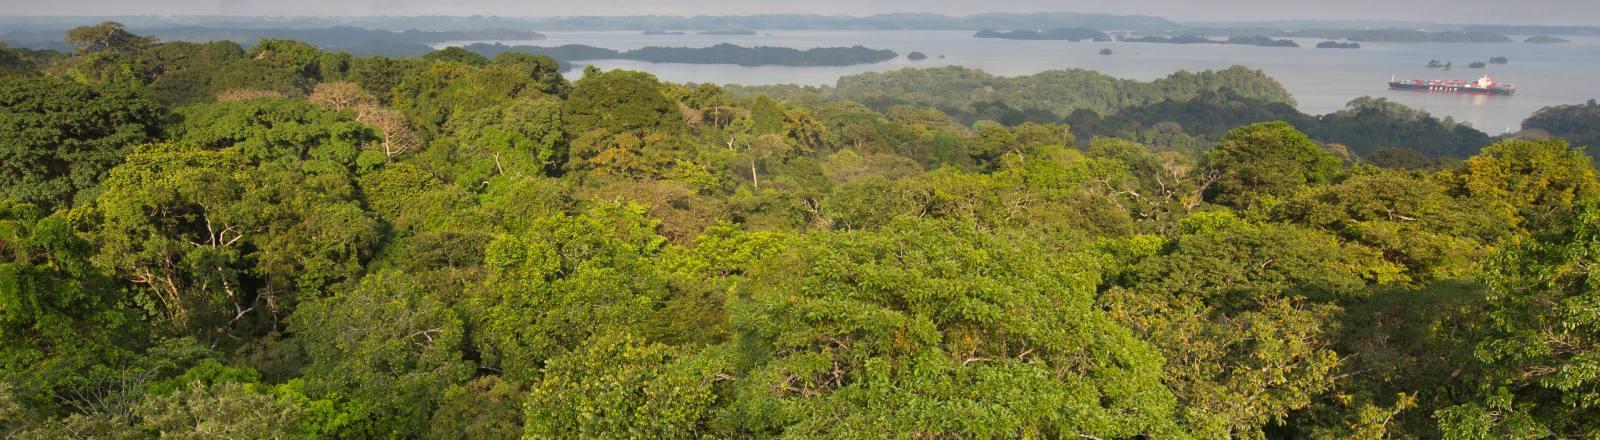 Regenwald in Panama